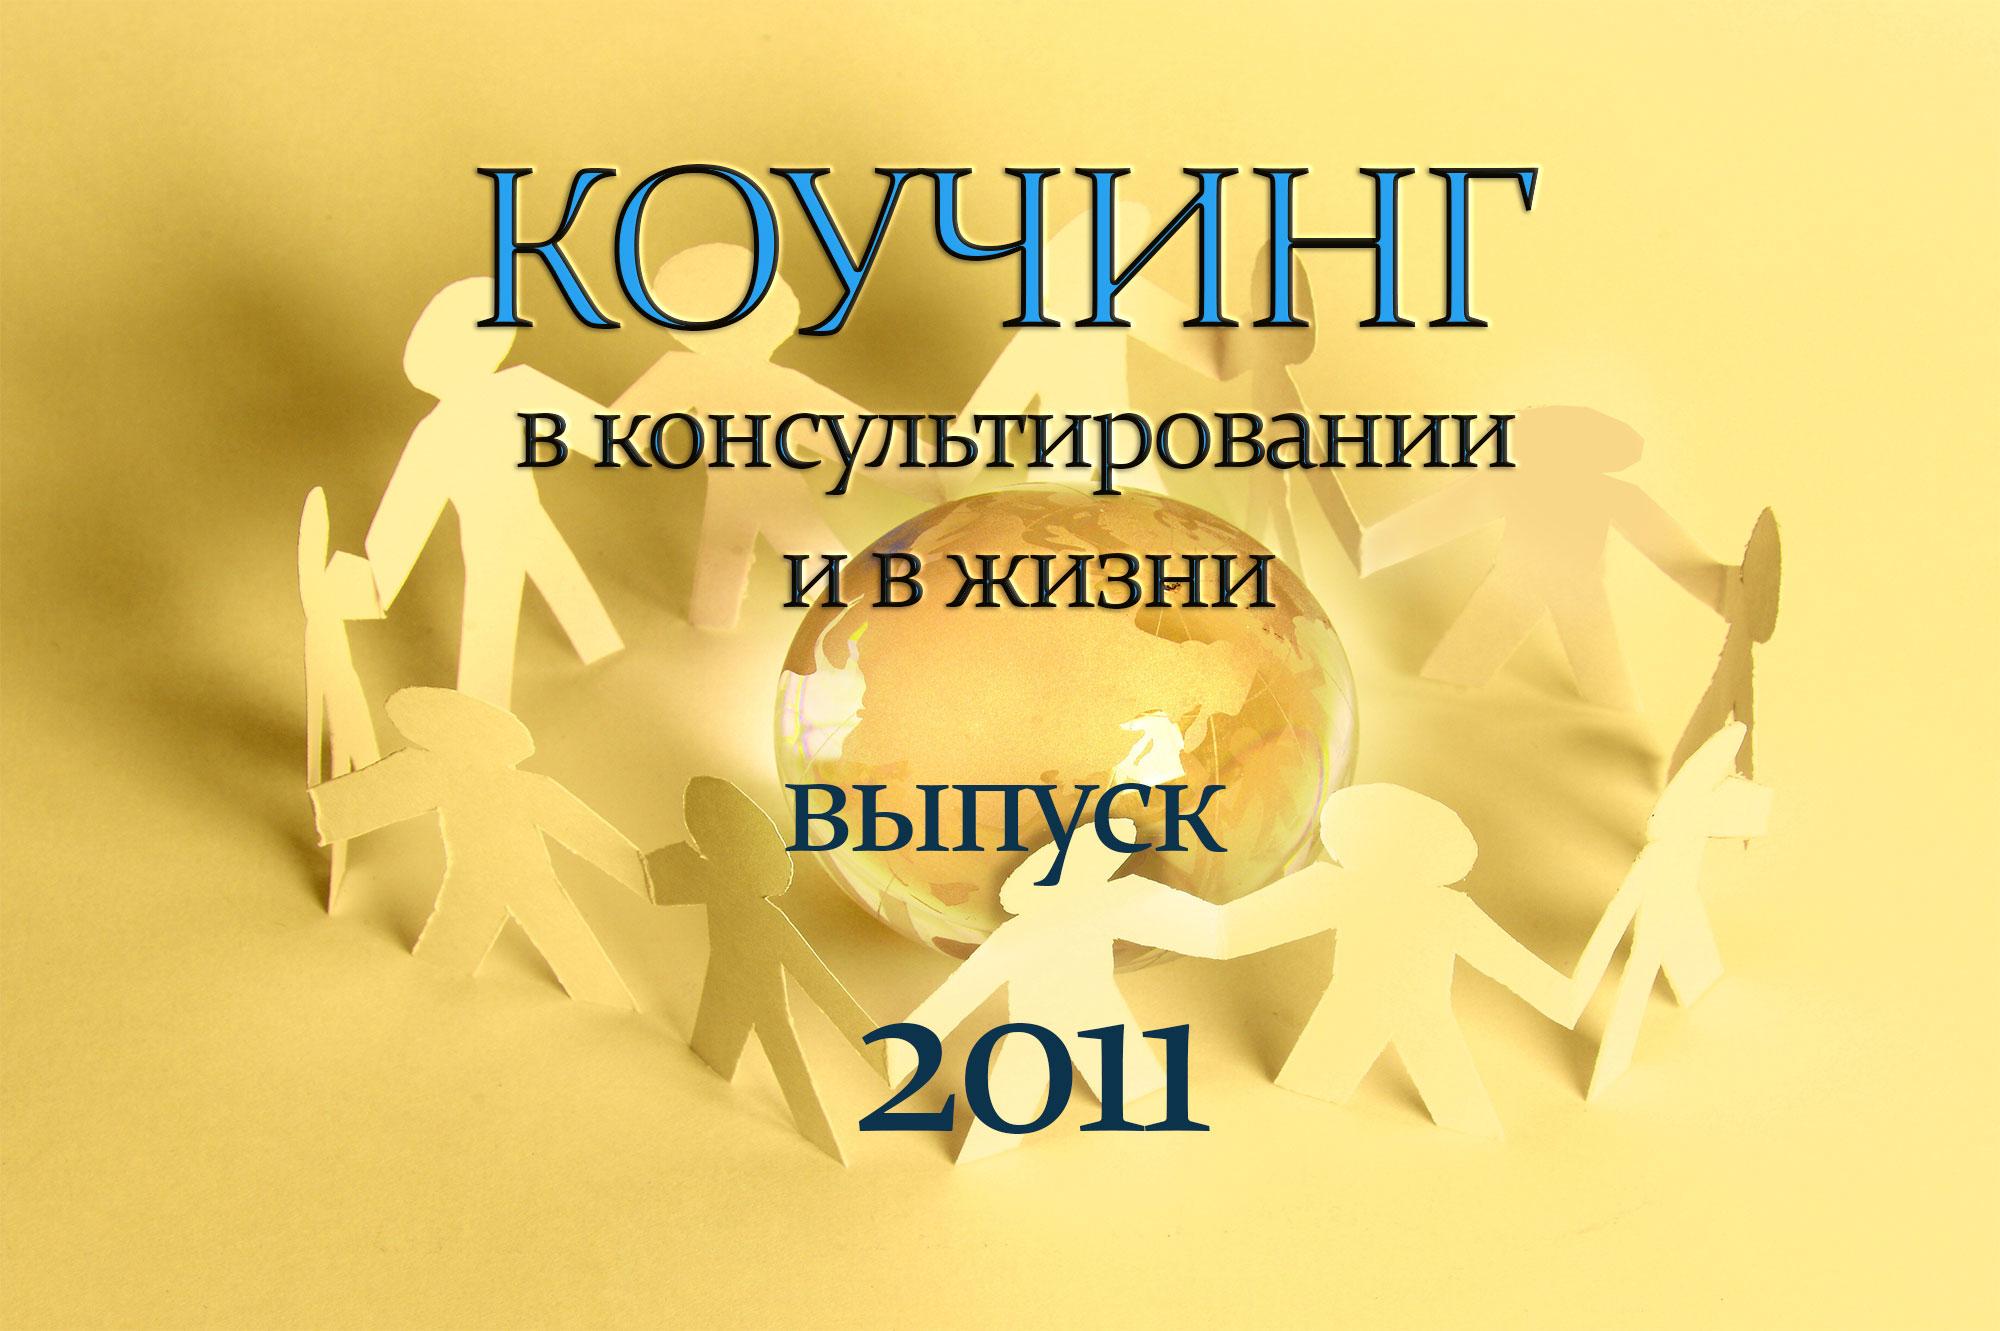 http://psyholog.biz/wp-content/uploads/2017/09/kouching2011.jpg